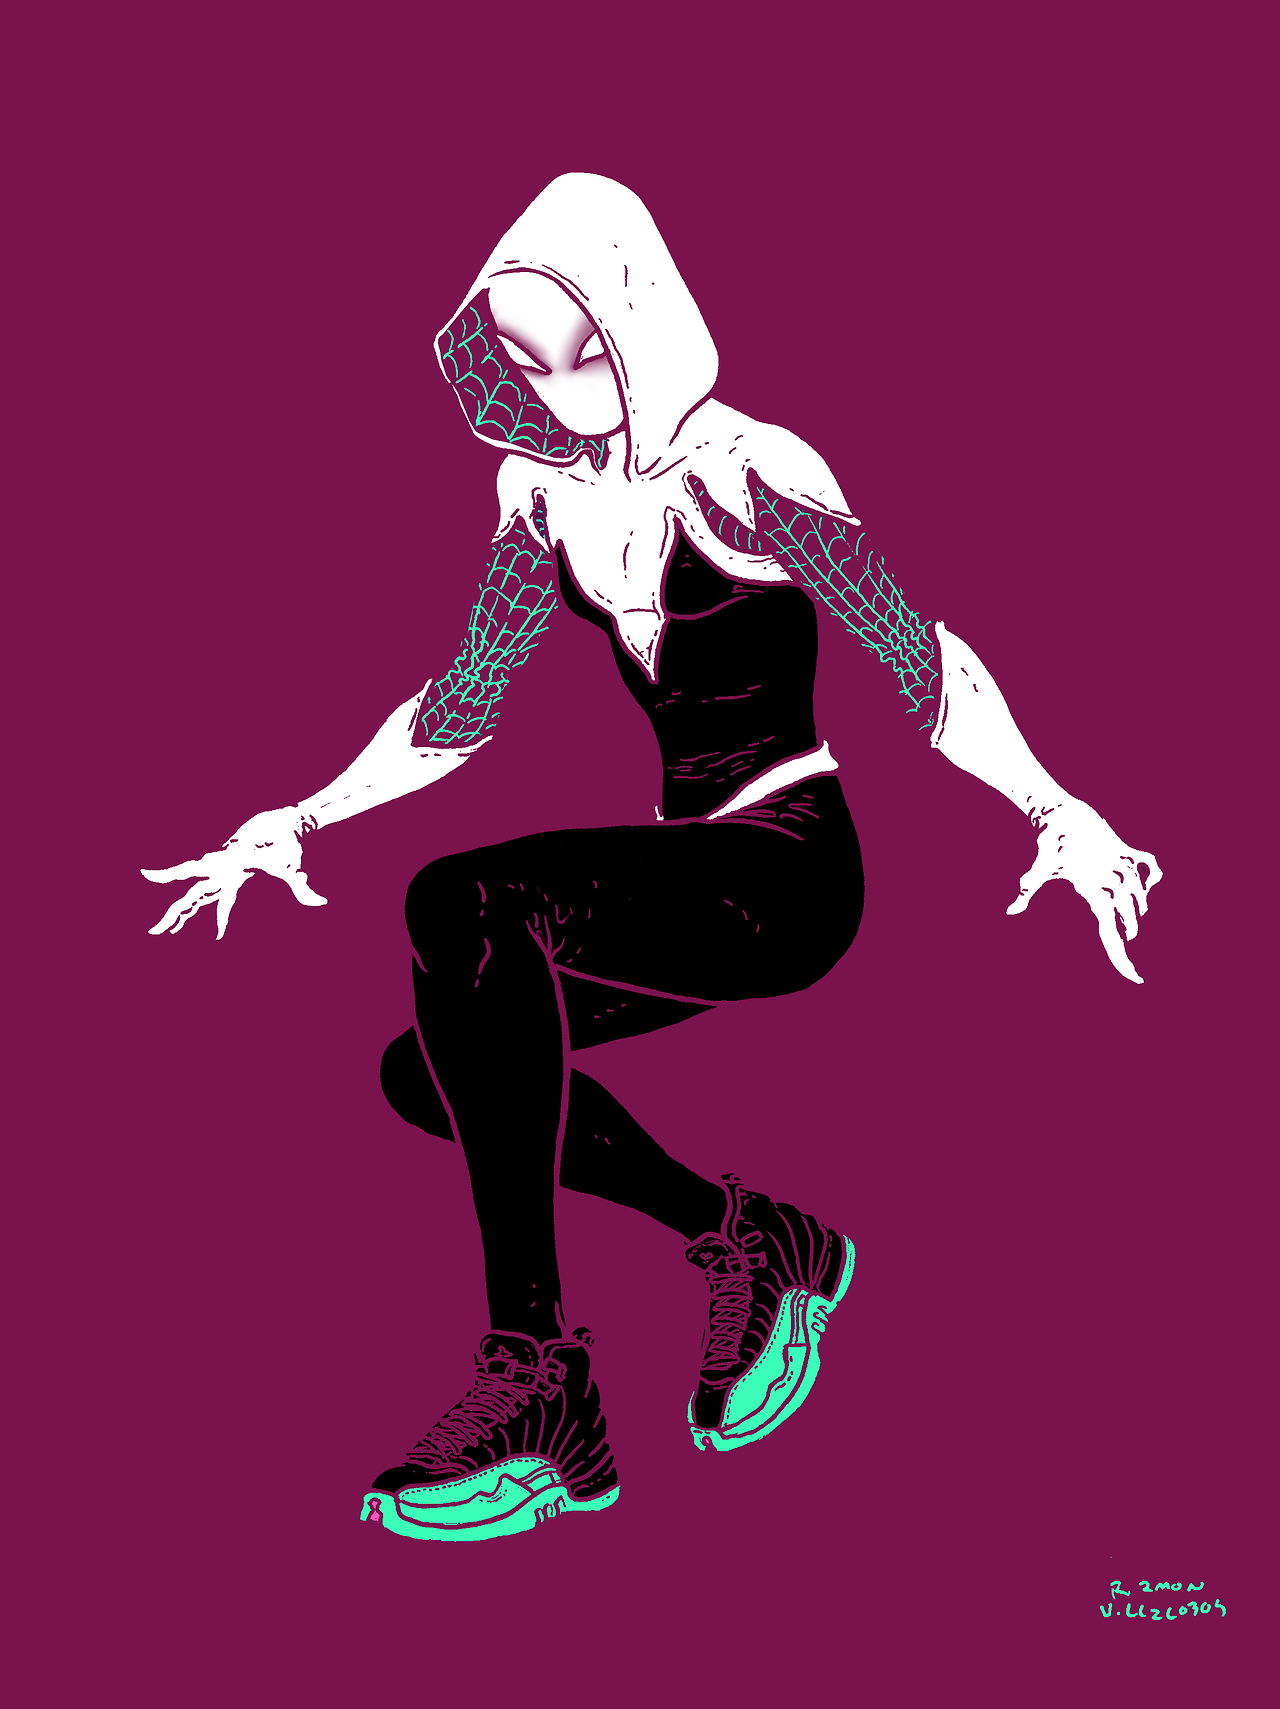 Spider-Woman Villalobos